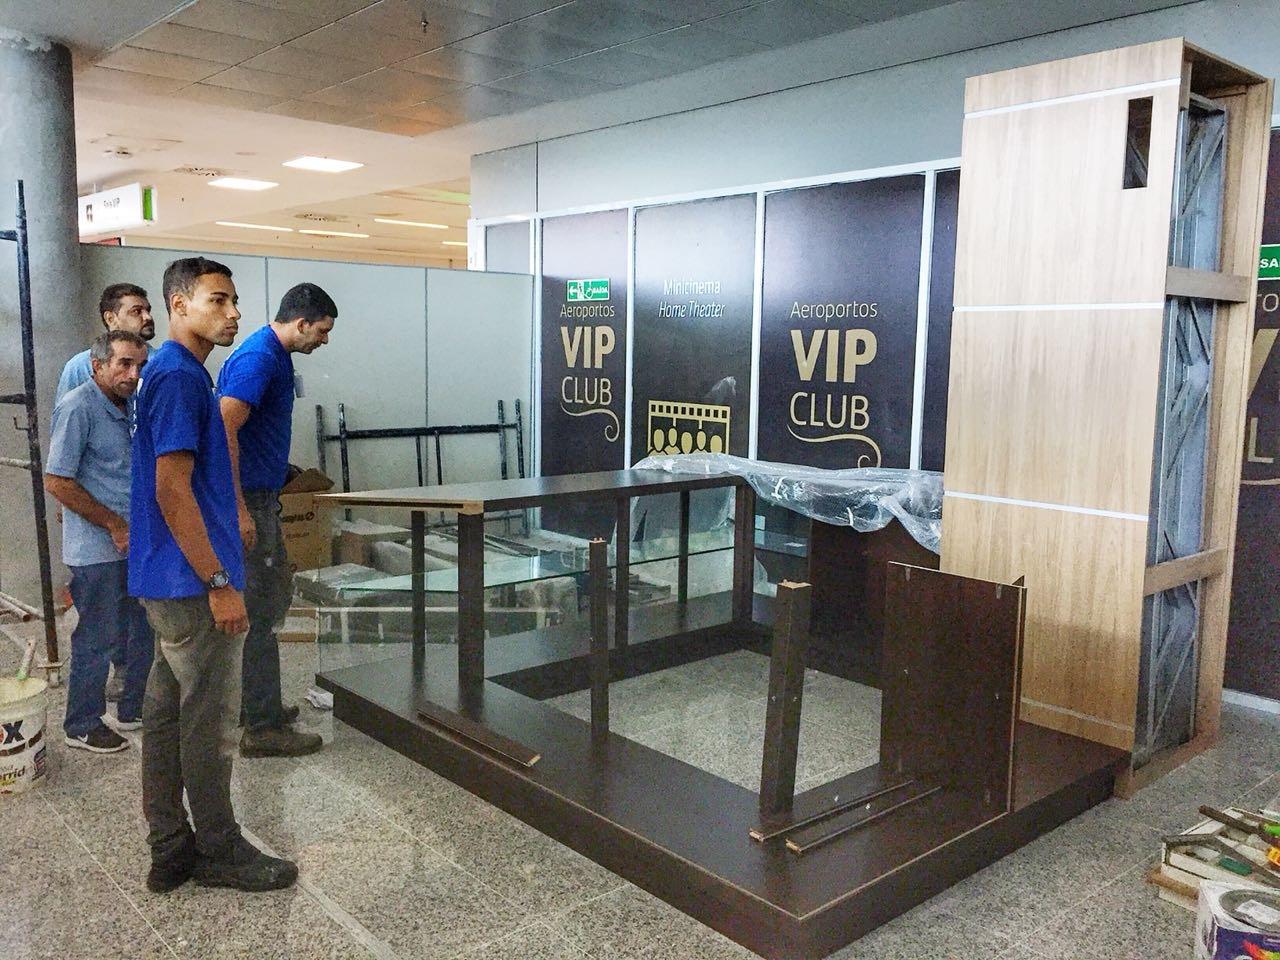 Artesanato são-gonçalense recebe quiosque no Aeroporto Internacional Aluízio Alves